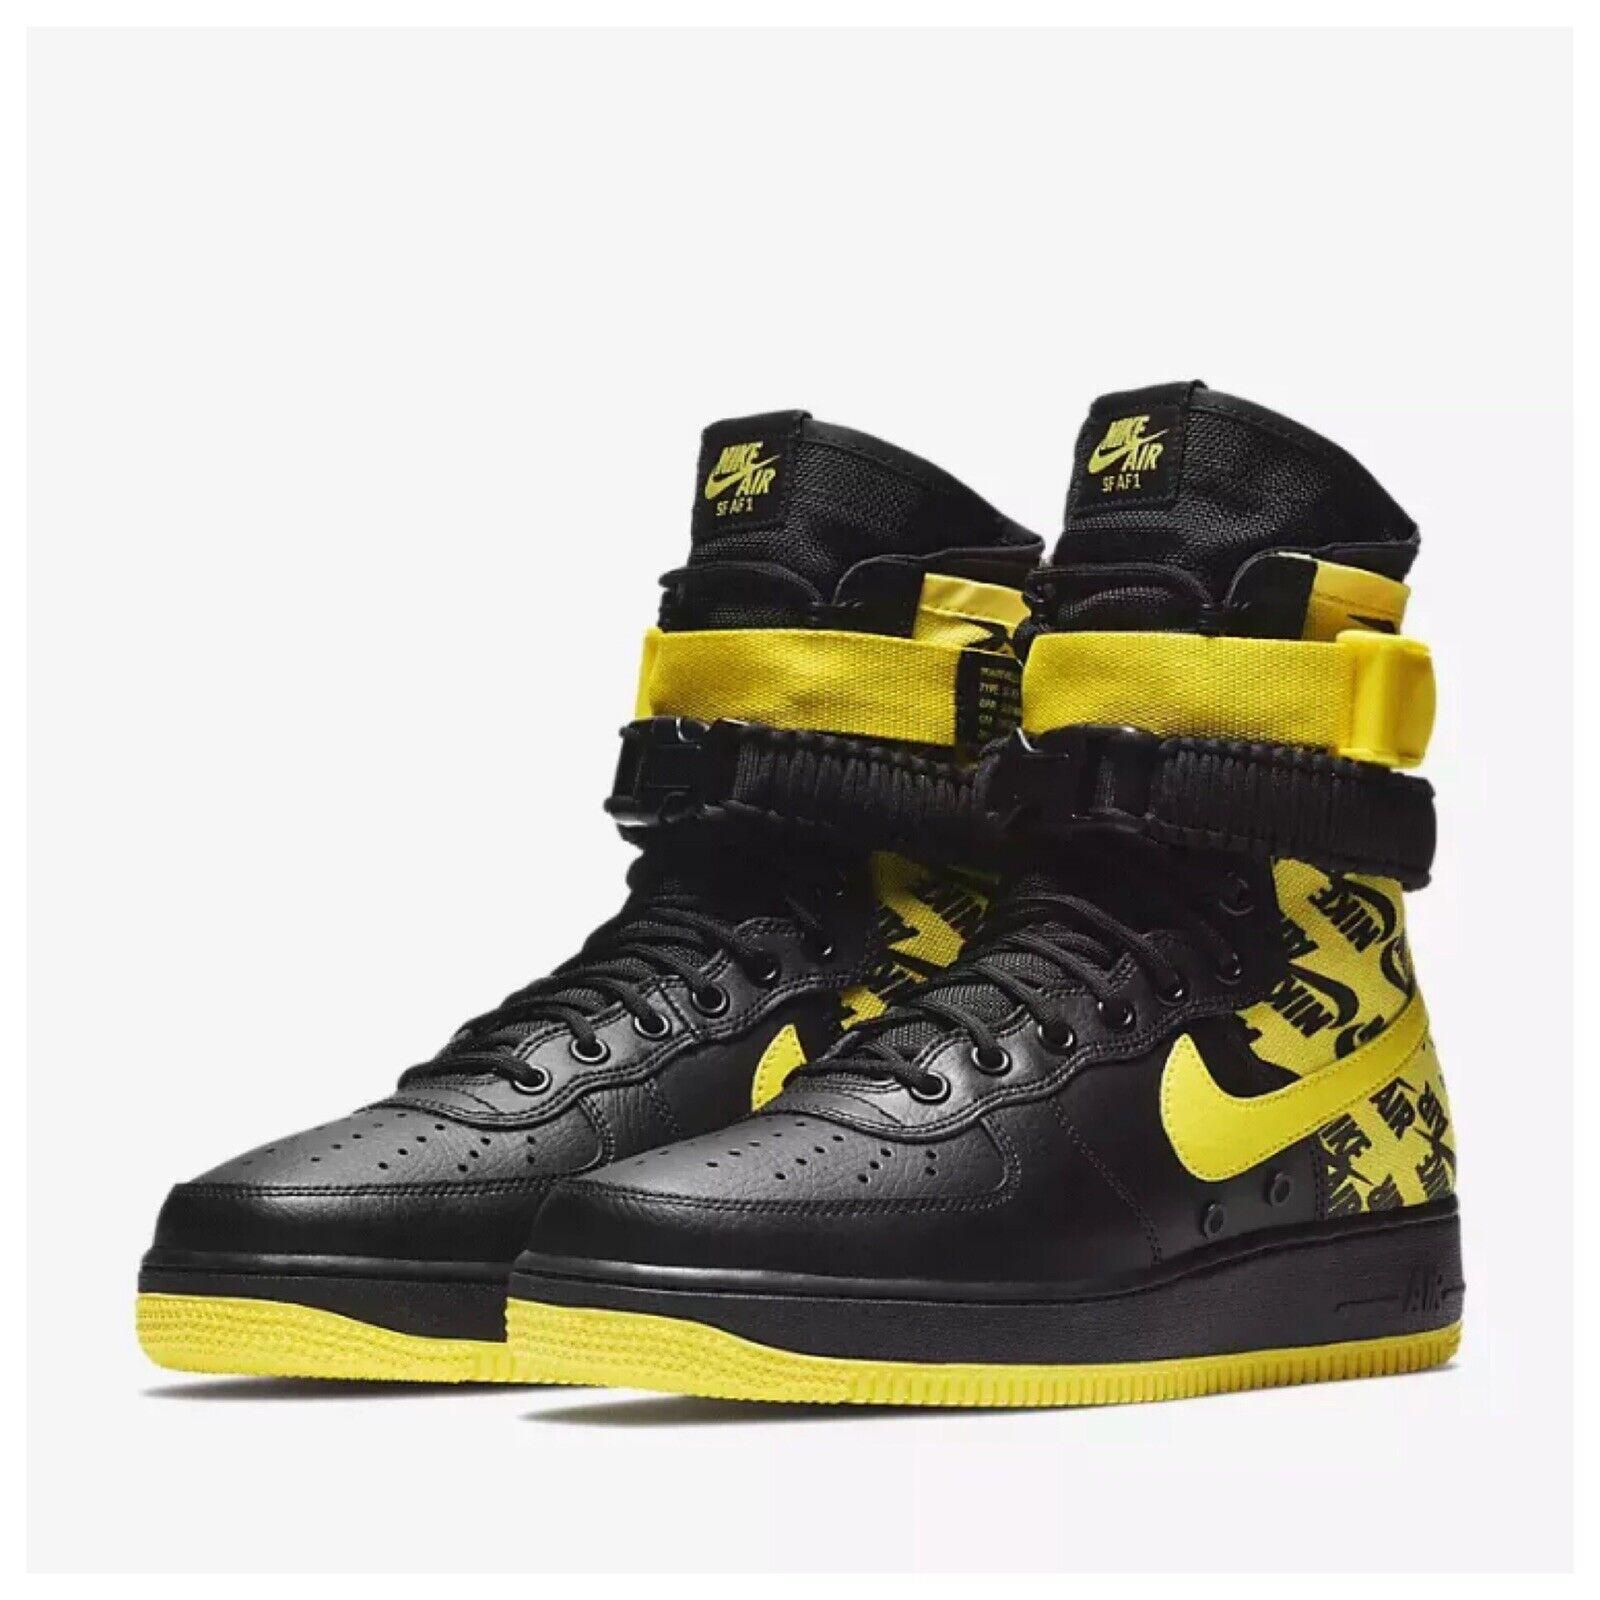 Nike SF AF1 Air Force One High Black Dynamic Yellow Sneakers AR1955-001 Sz 8-11